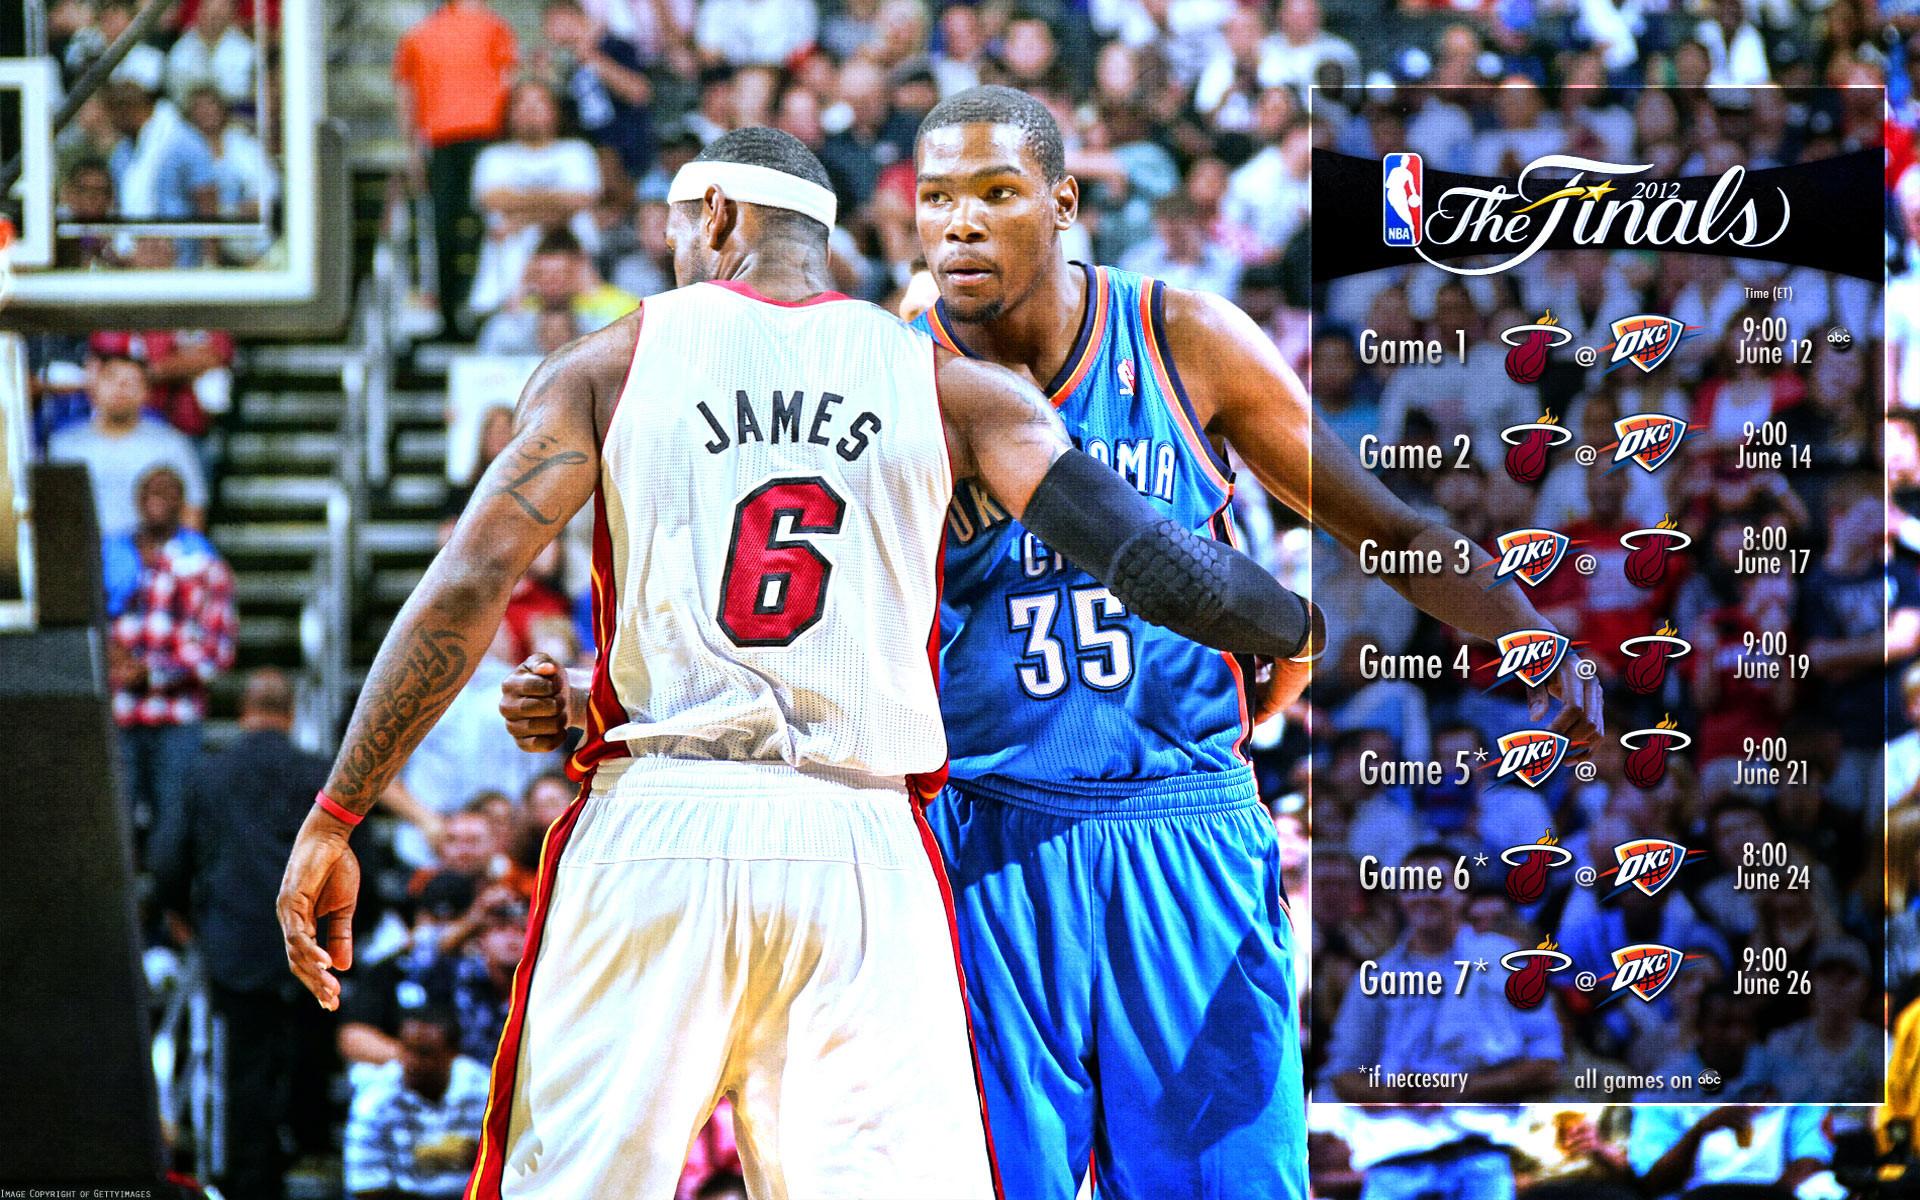 2012 NBA Finals Schedule Wallpaper